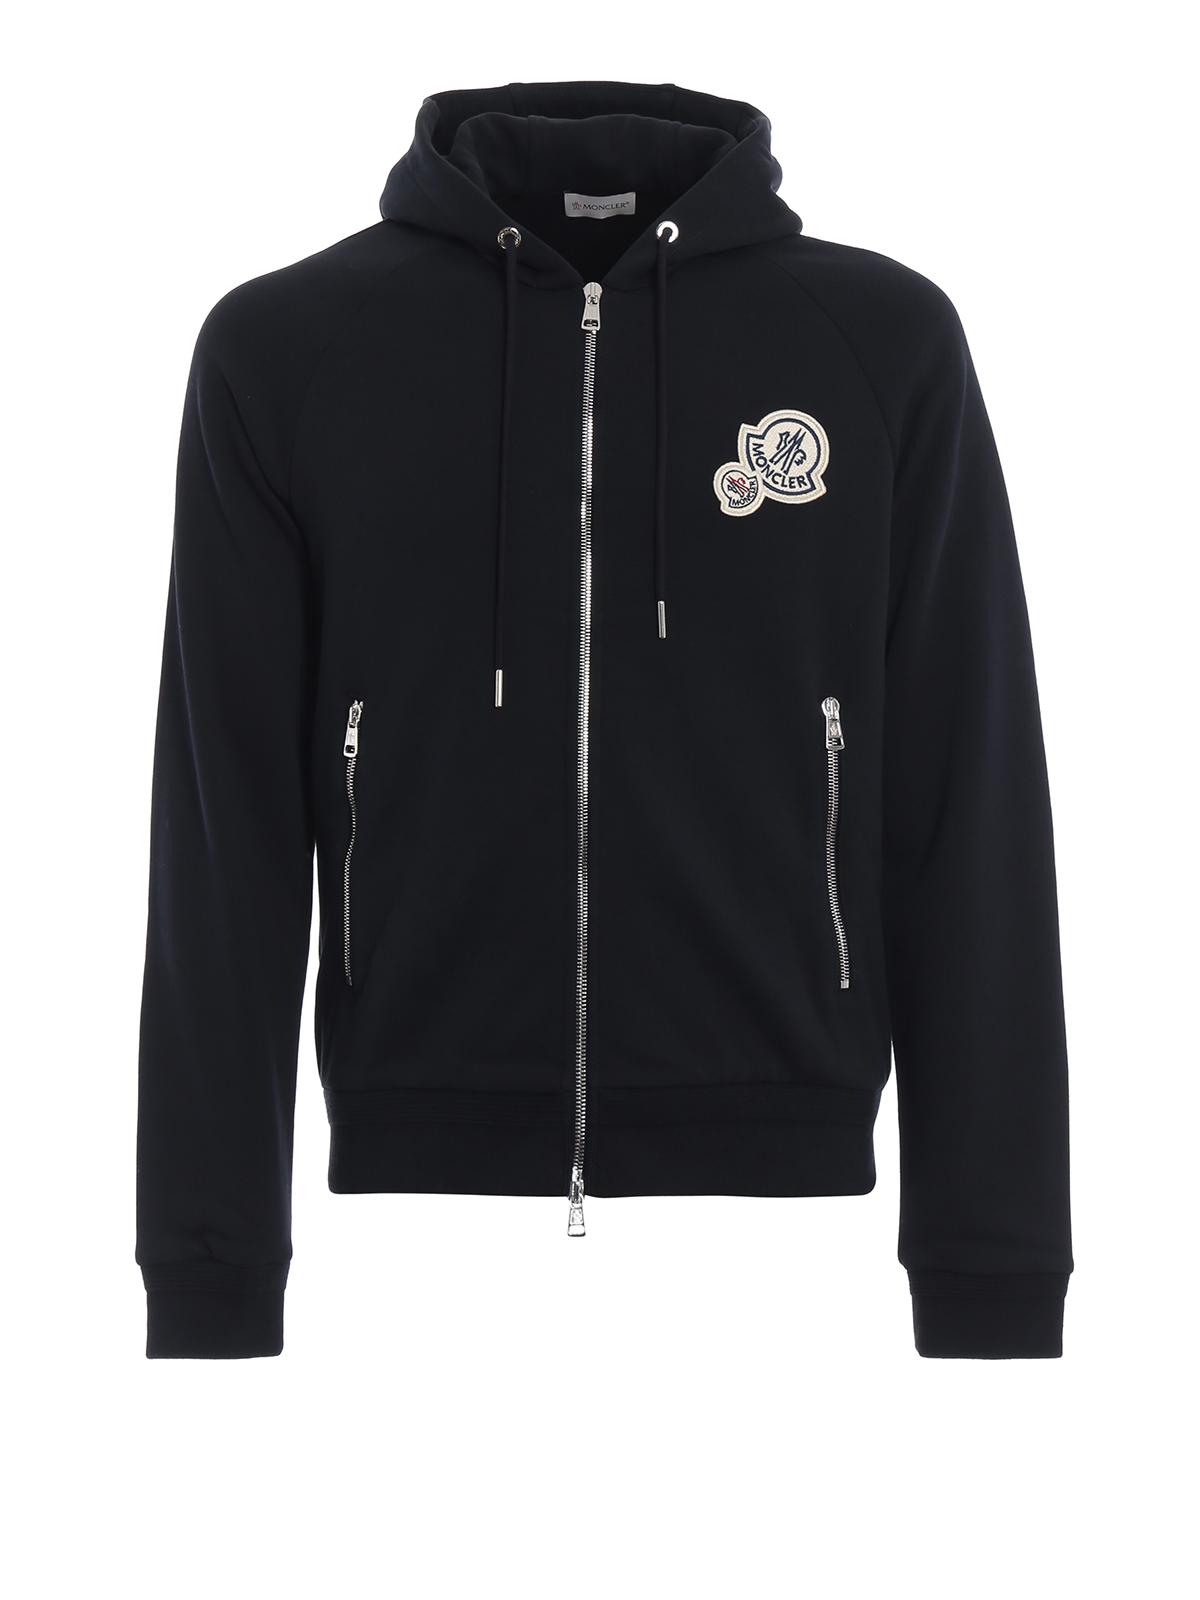 99eb2686703d Moncler - Double logo patch navy cotton fleece hoodie - Sweatshirts ...